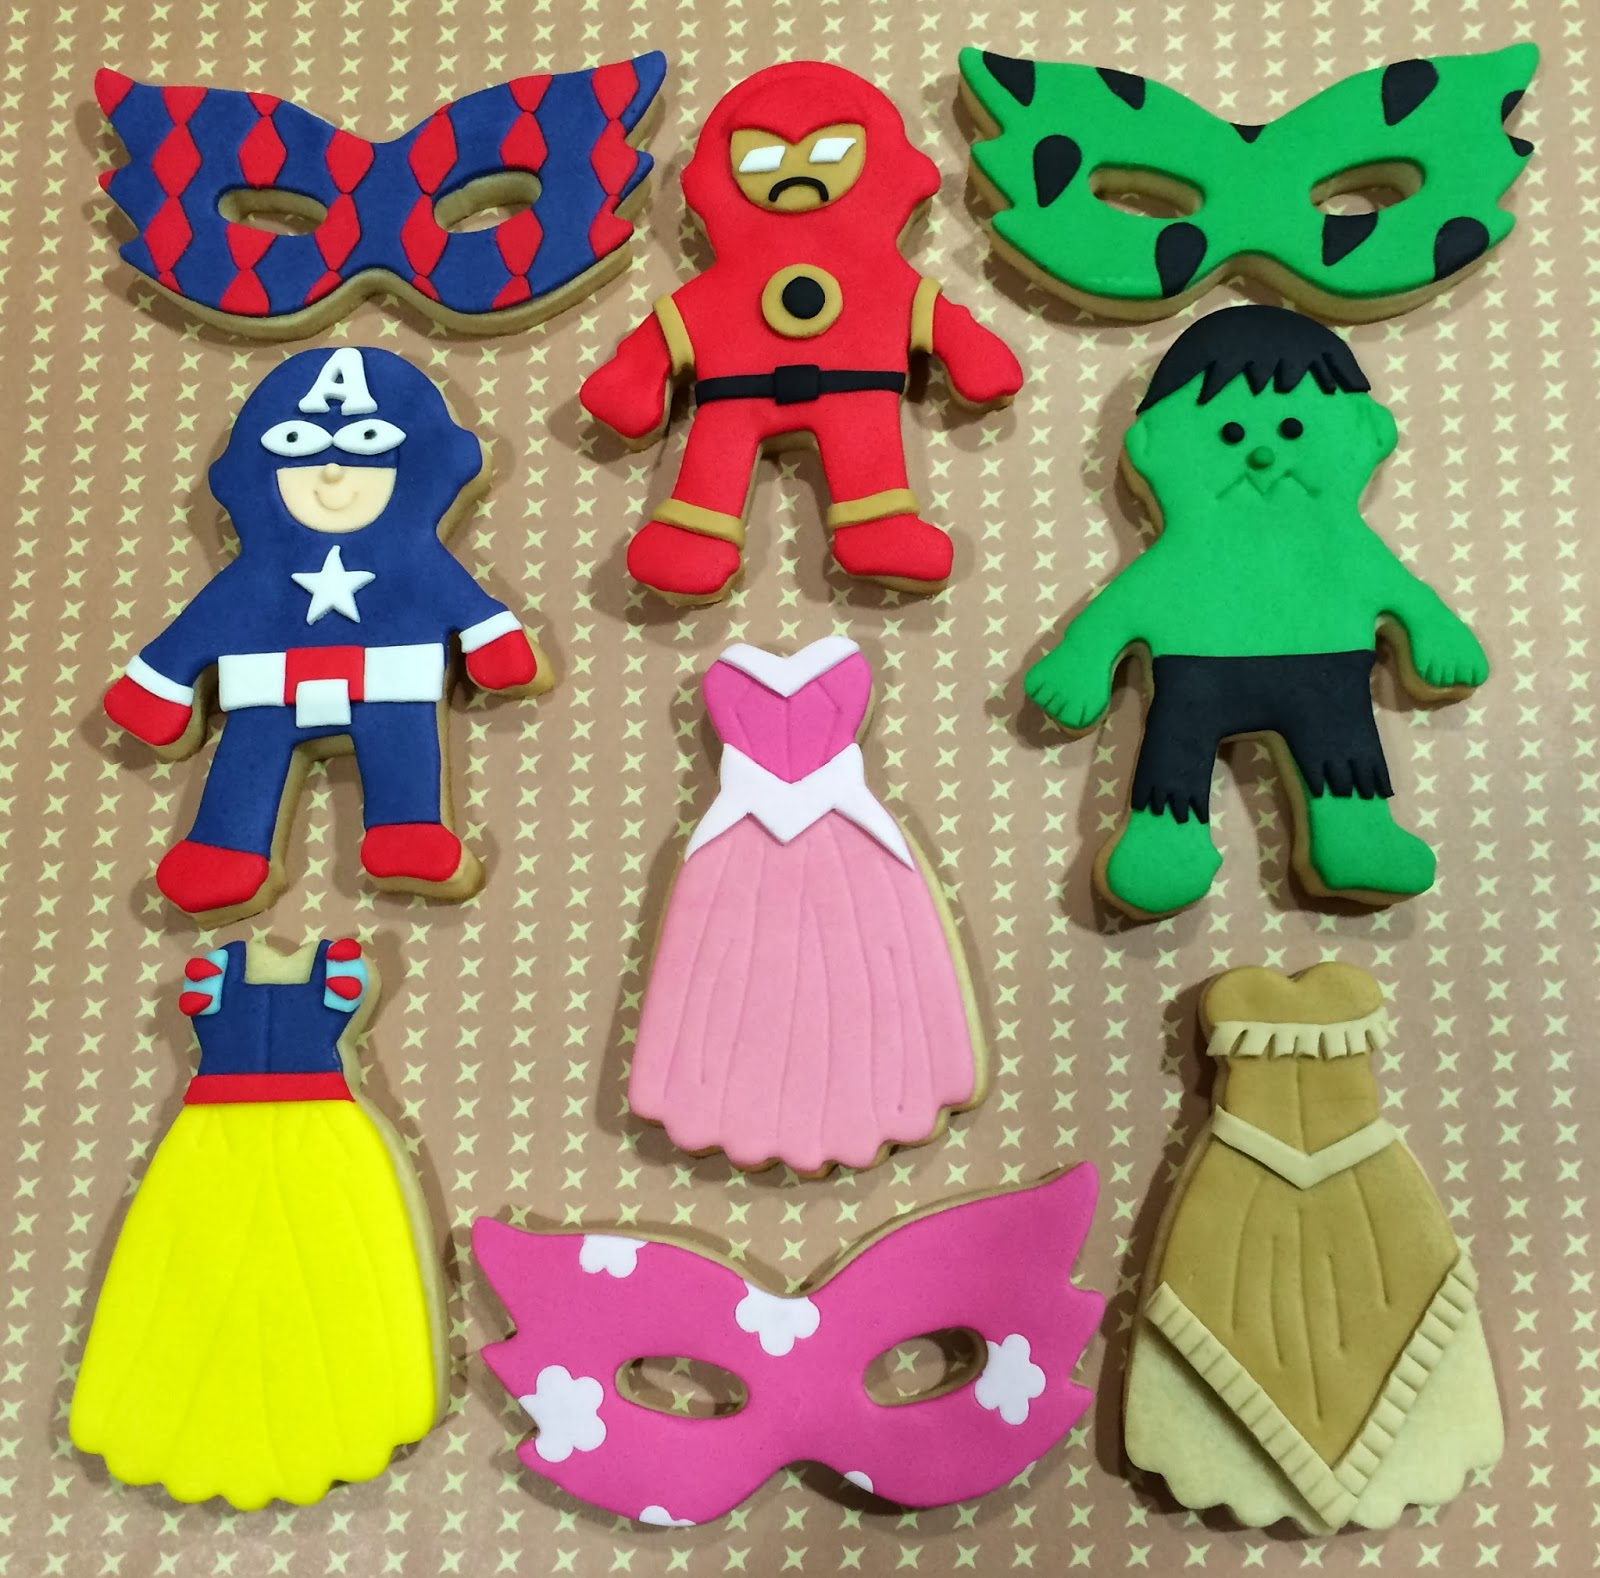 Disfraces para carnaval cake ideas and designs - Disfraz de pescado ...